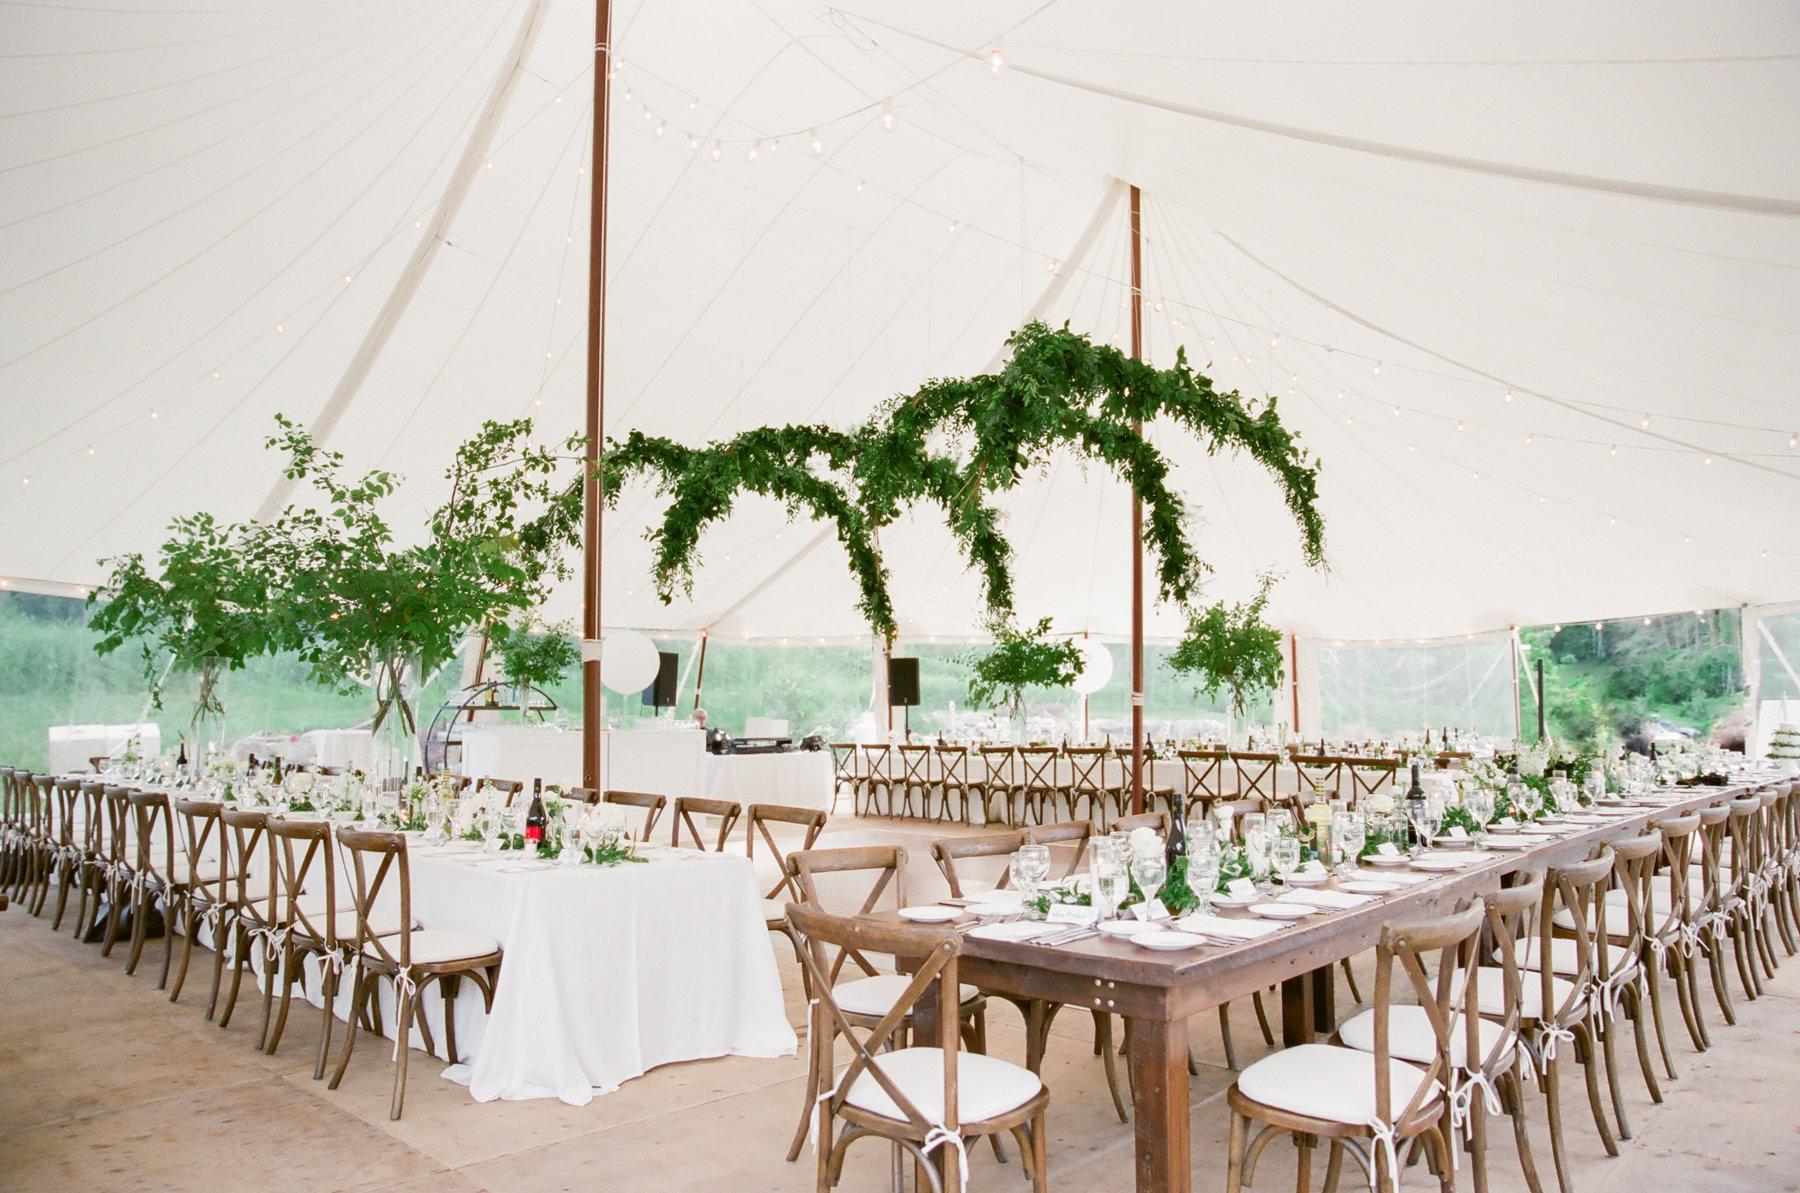 0774-maggiebrett-private-estate-wedding-000006320005.jpg